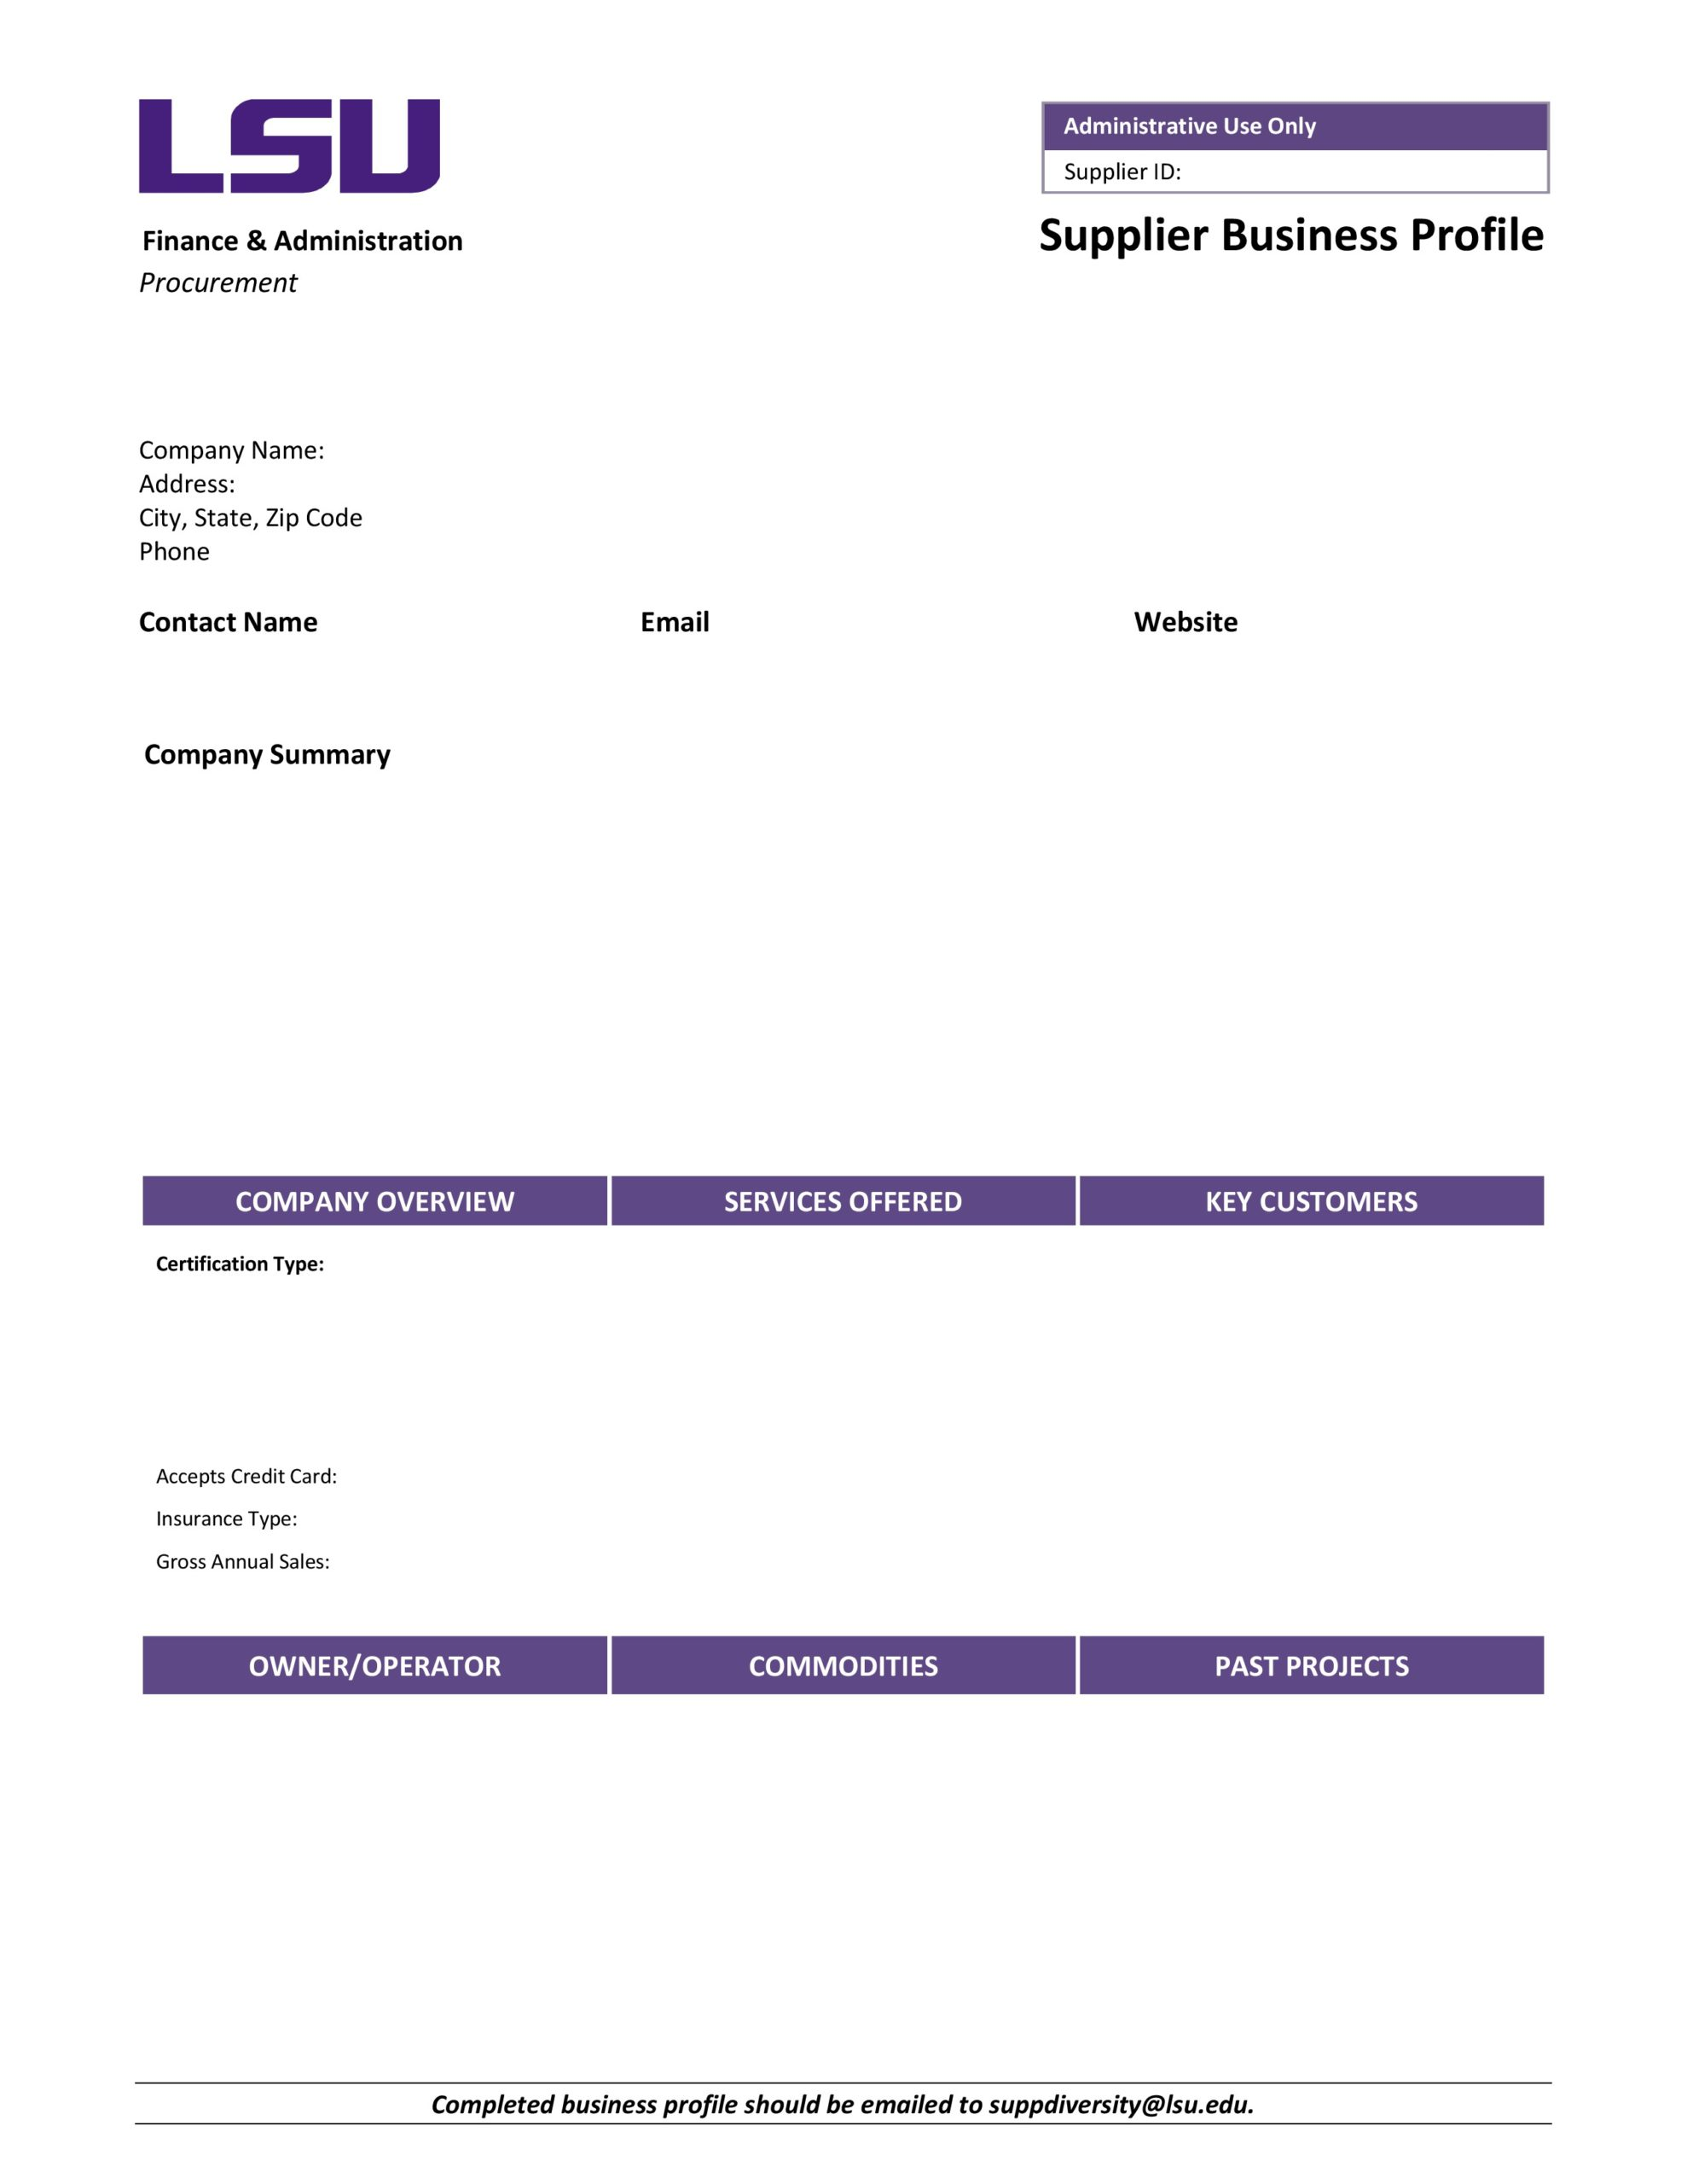 Free company profile template 11